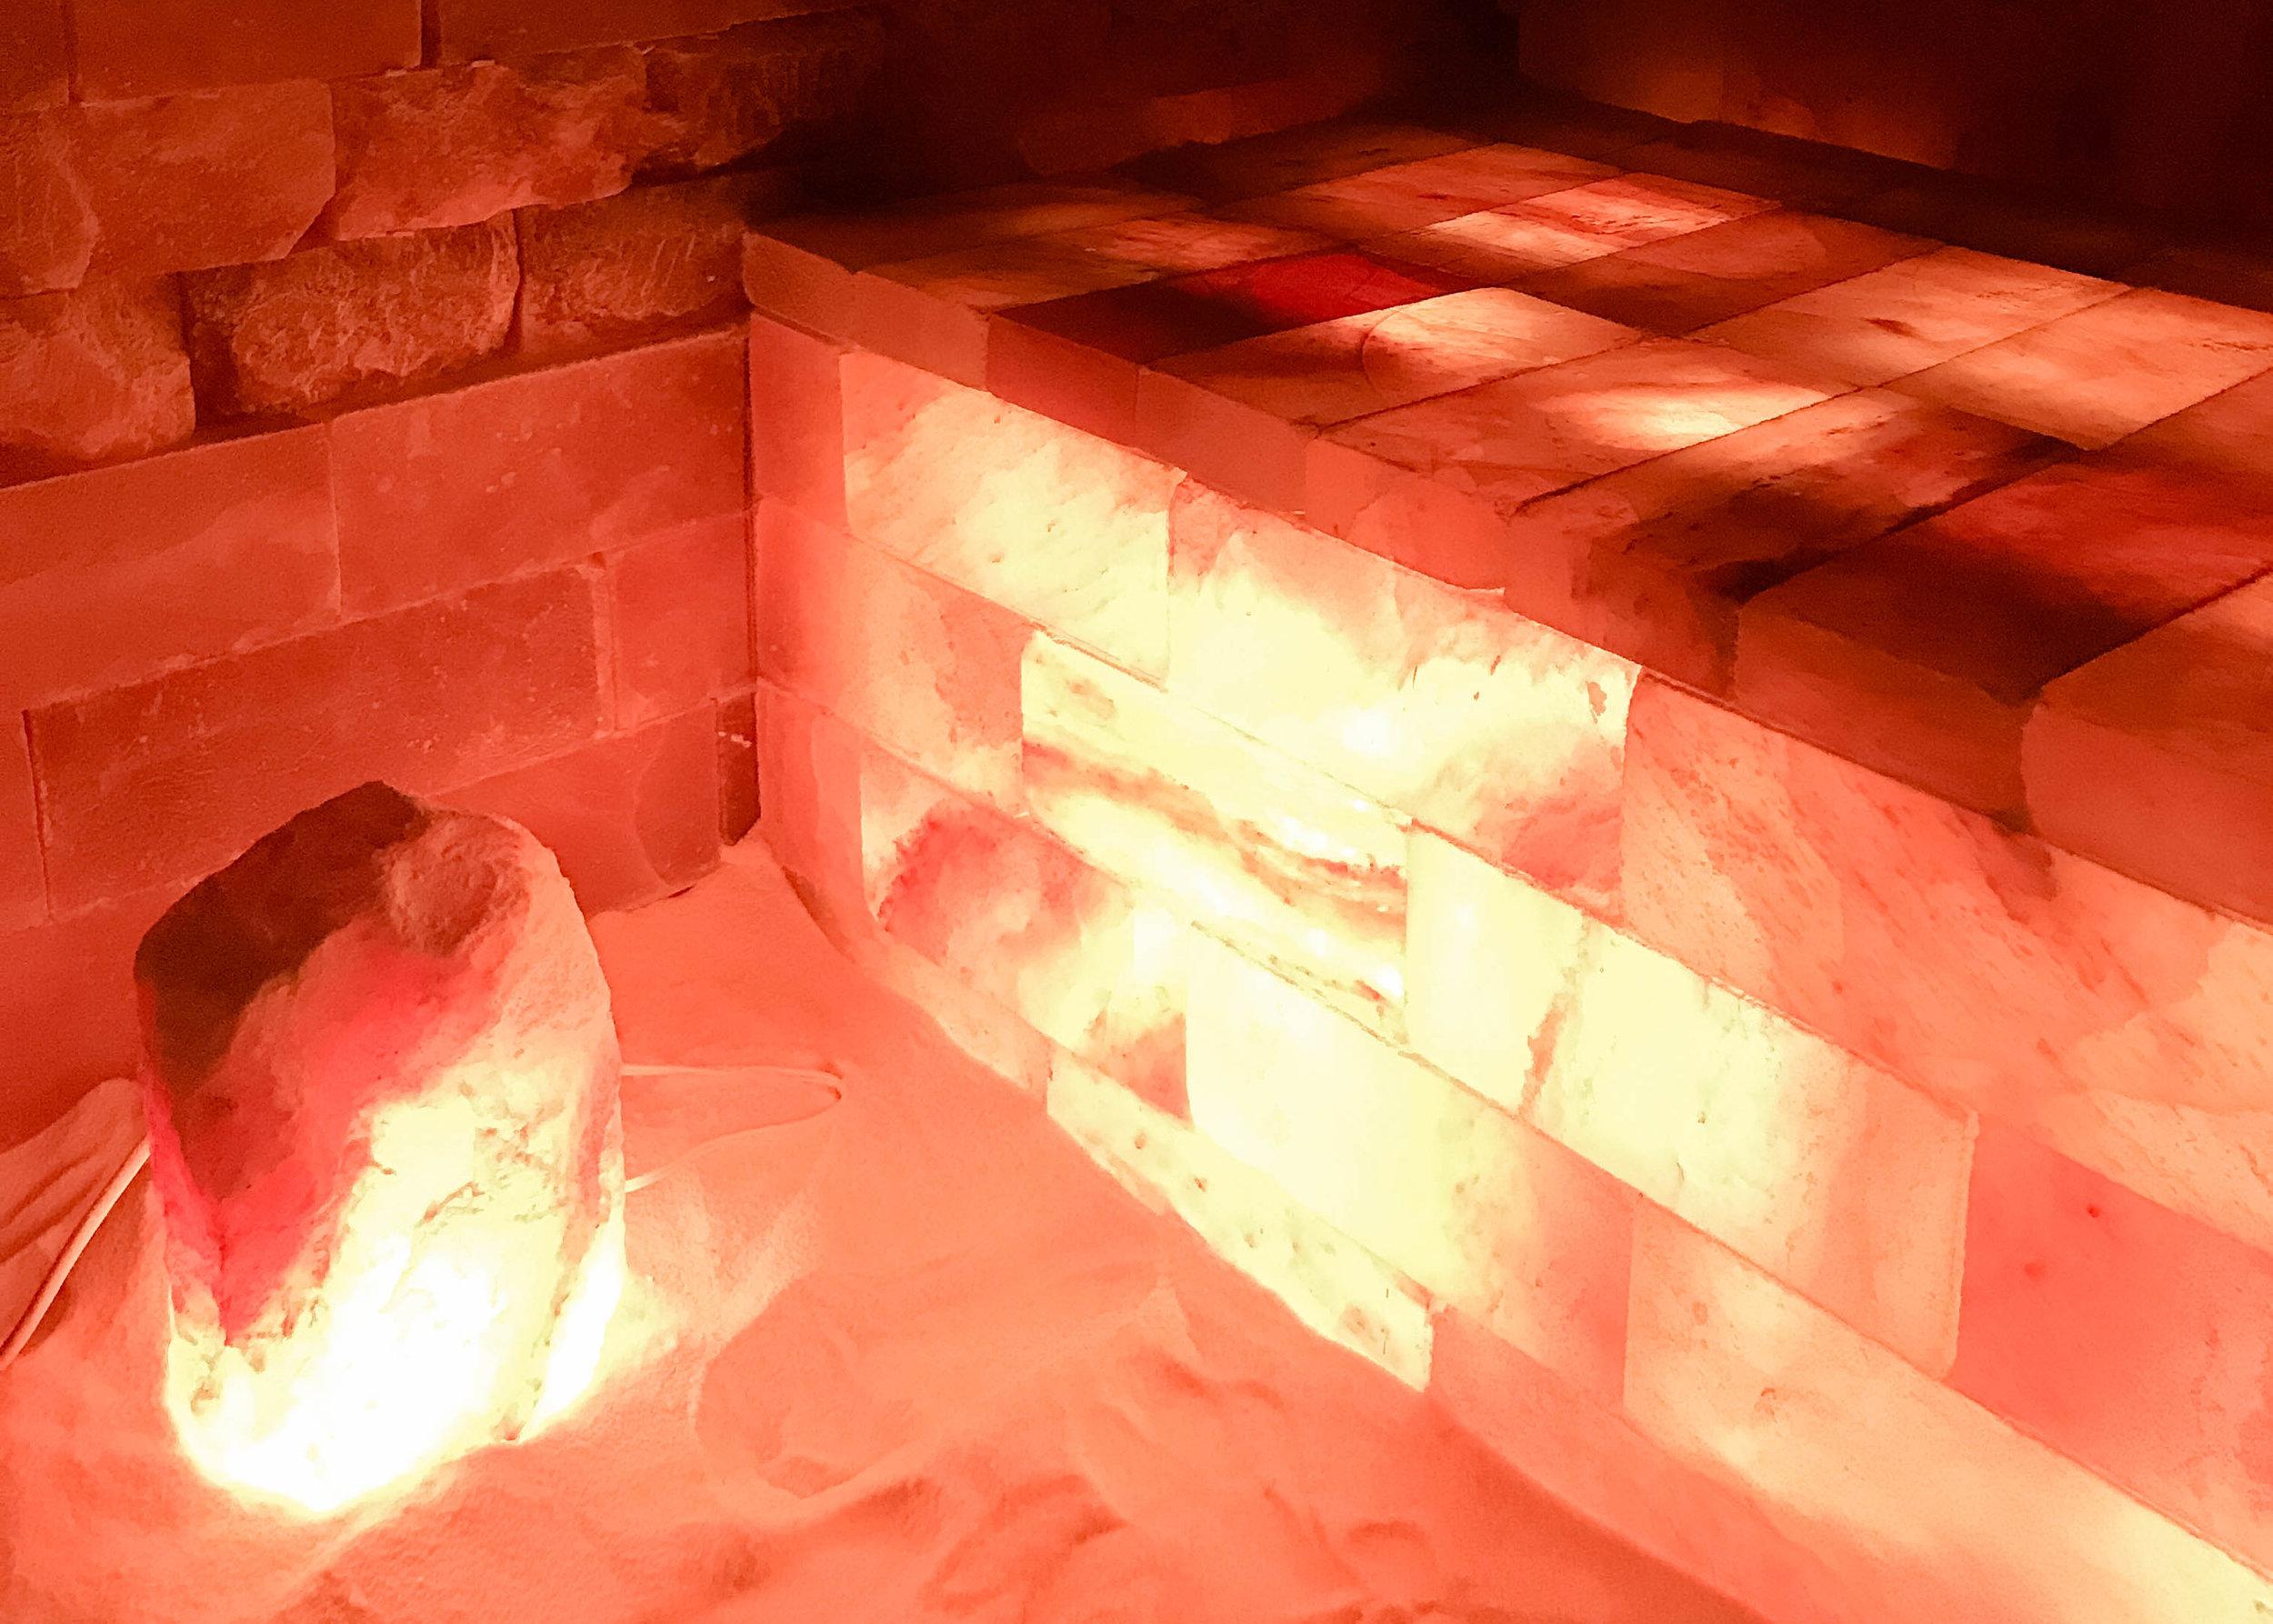 my-experience-in-a-salt-cave-natures-salt-cave-cranford-nj-lamp-seat.jpg